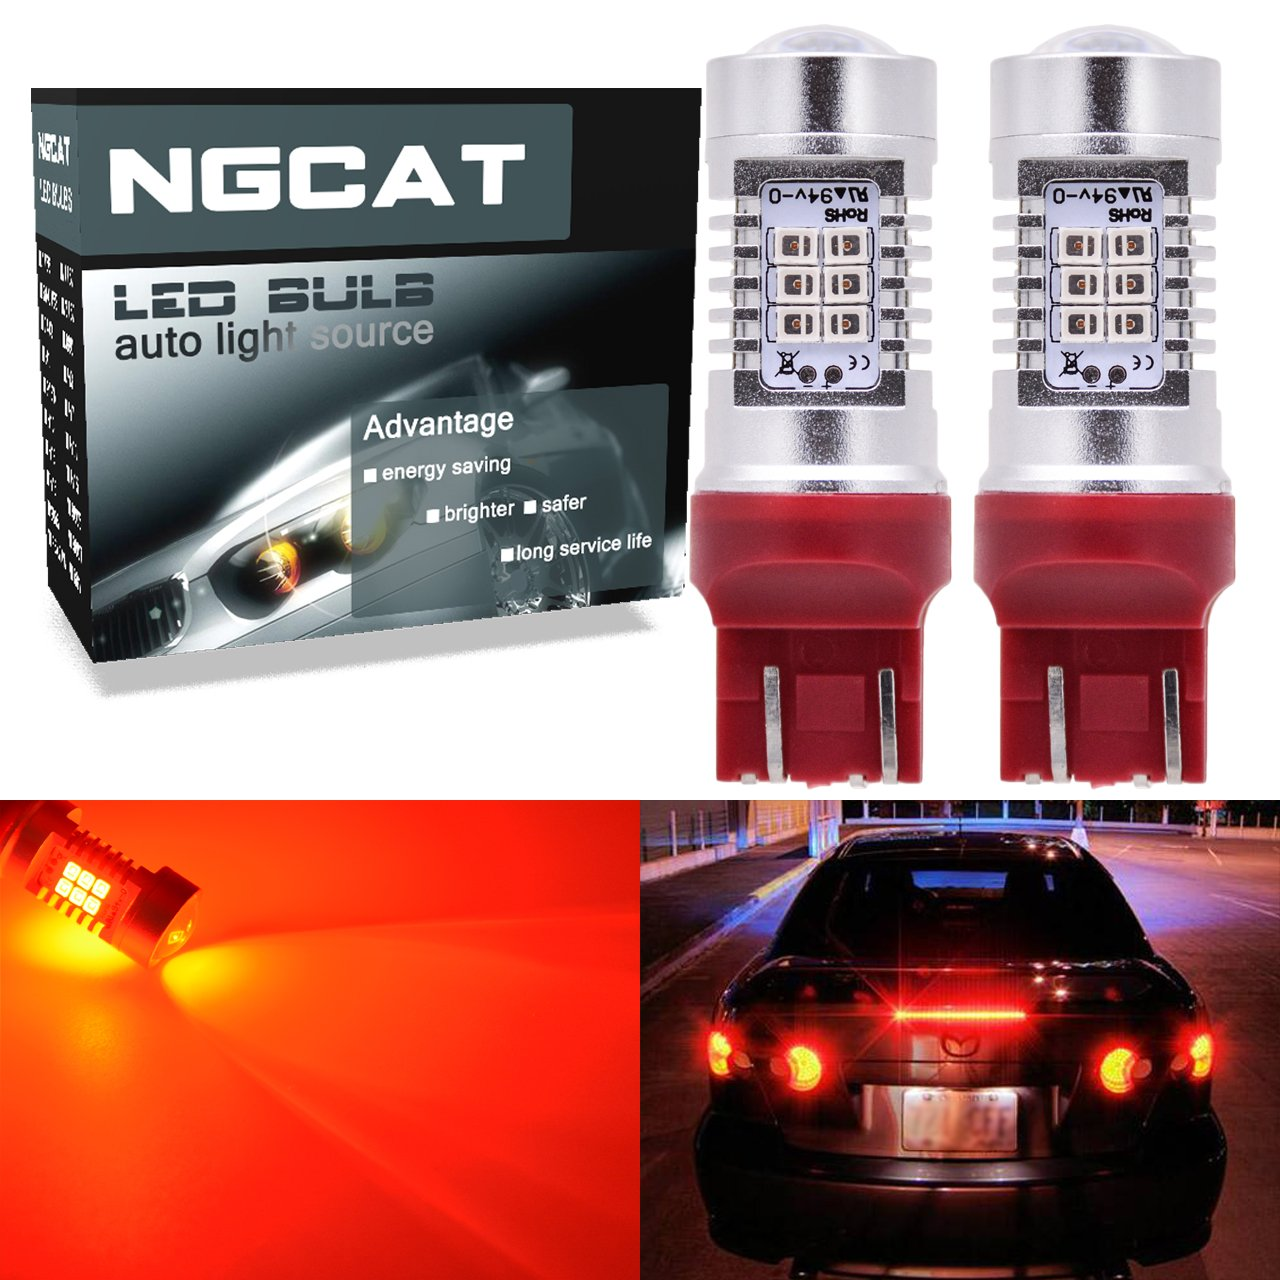 ngcat Auto bombilla LED 2pcs 7444 na 7440 7440 na 7441 992 T20 chipsets 2835 21 SMD LED Bombillas con proyector lente de freno intermitentes cola de copia de seguridad Reverse luces, rojo 10 – &nb